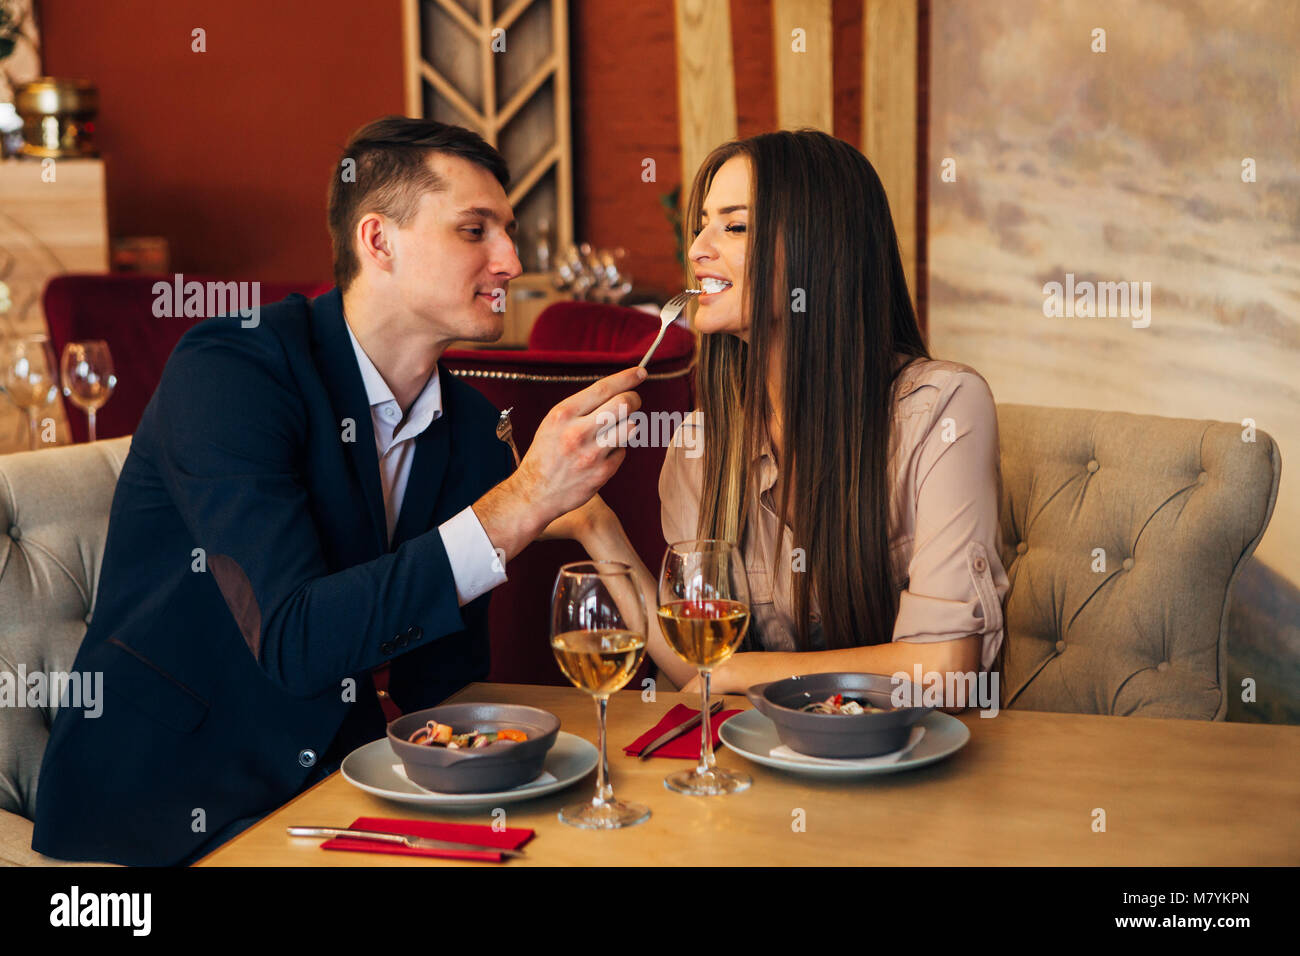 asian single men in rock tavern Rock springs online dating for rock springs singles 1,500,000 daily active members.